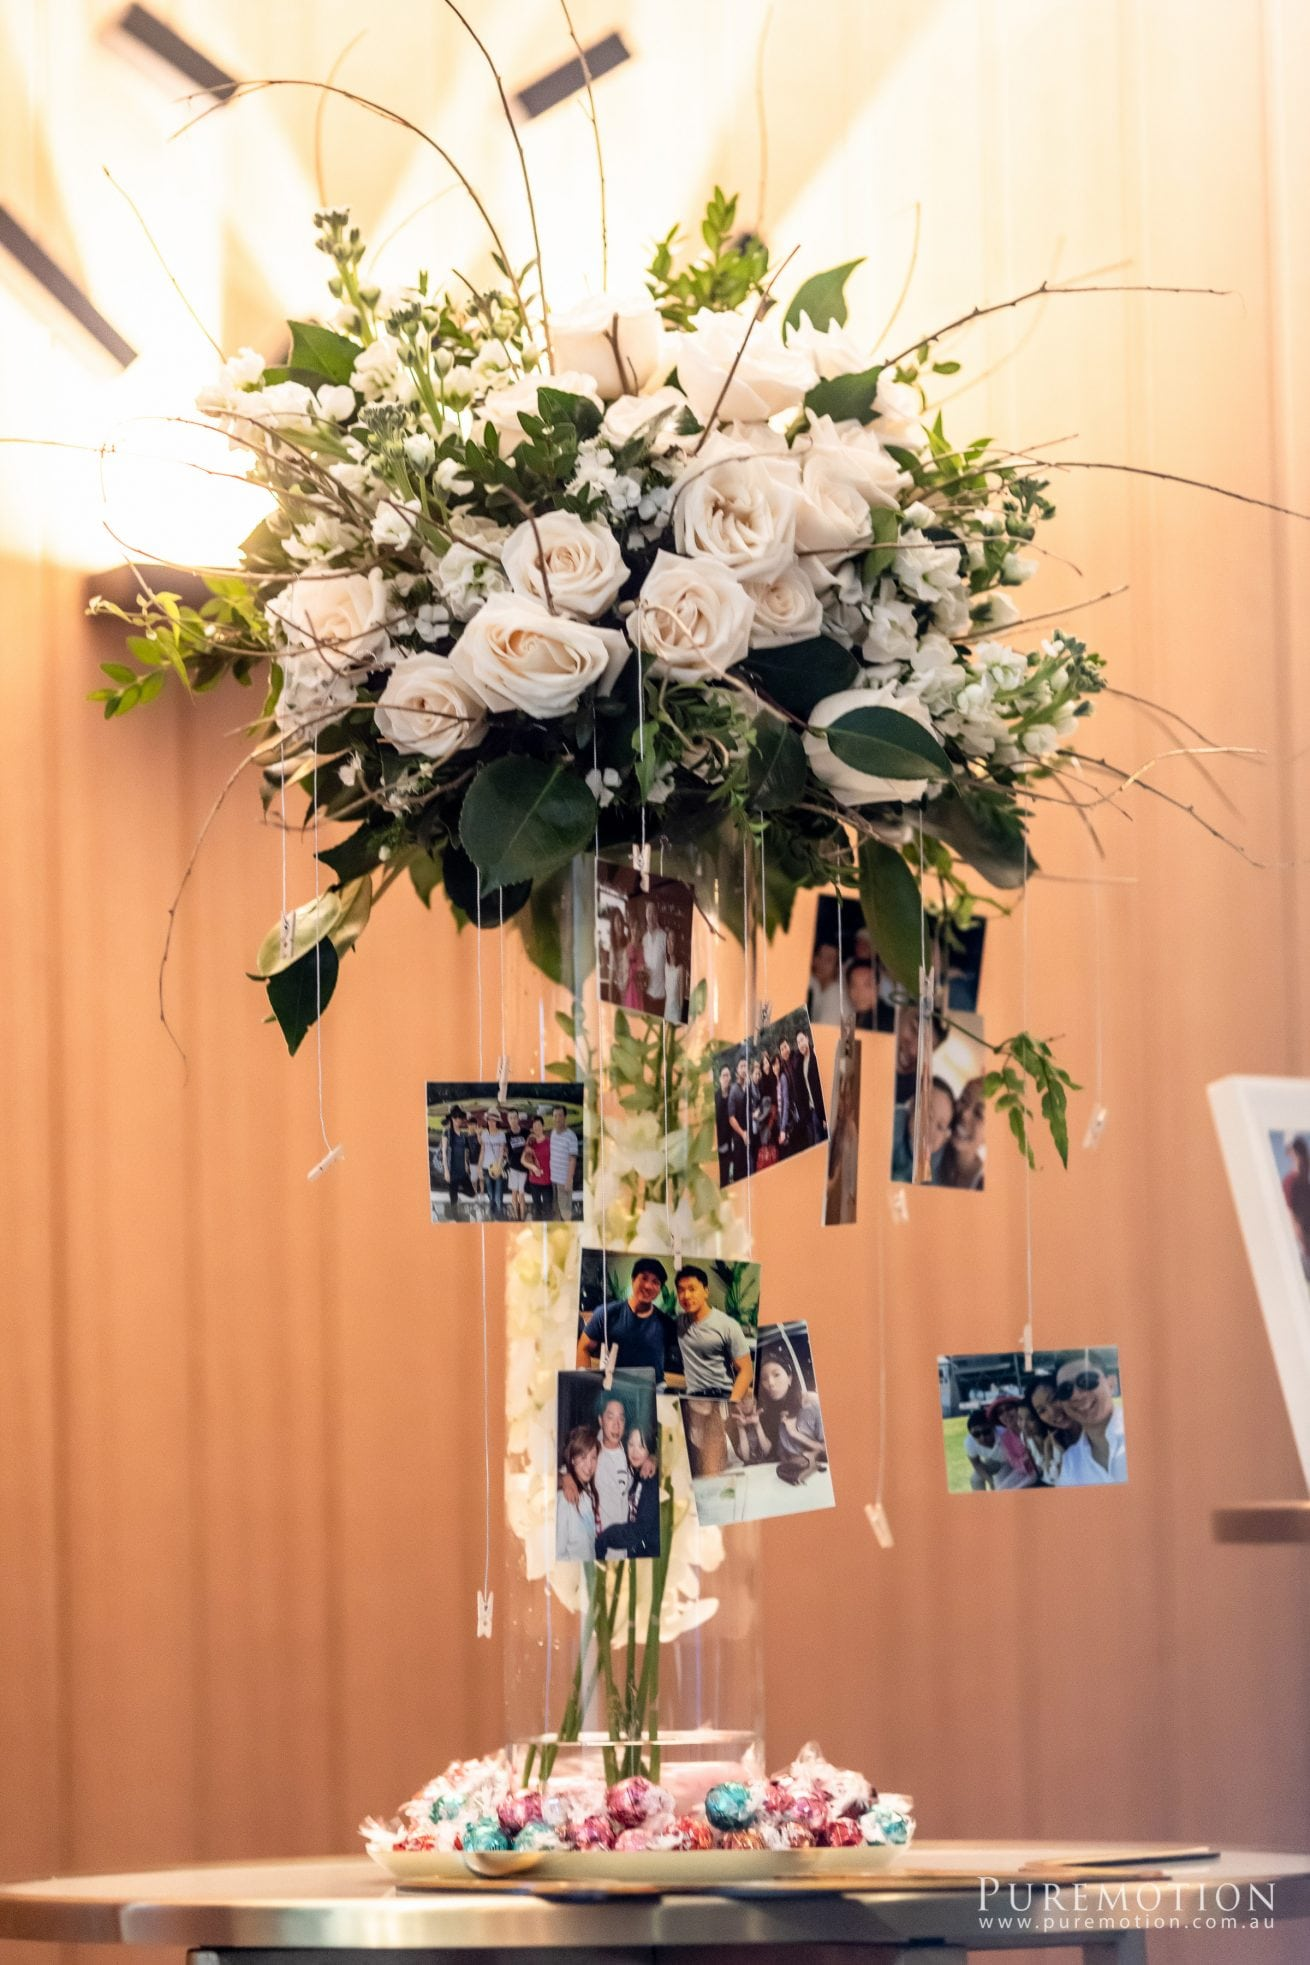 Puremotion Wedding Photography Alex Huang Brisbane W Hotel030